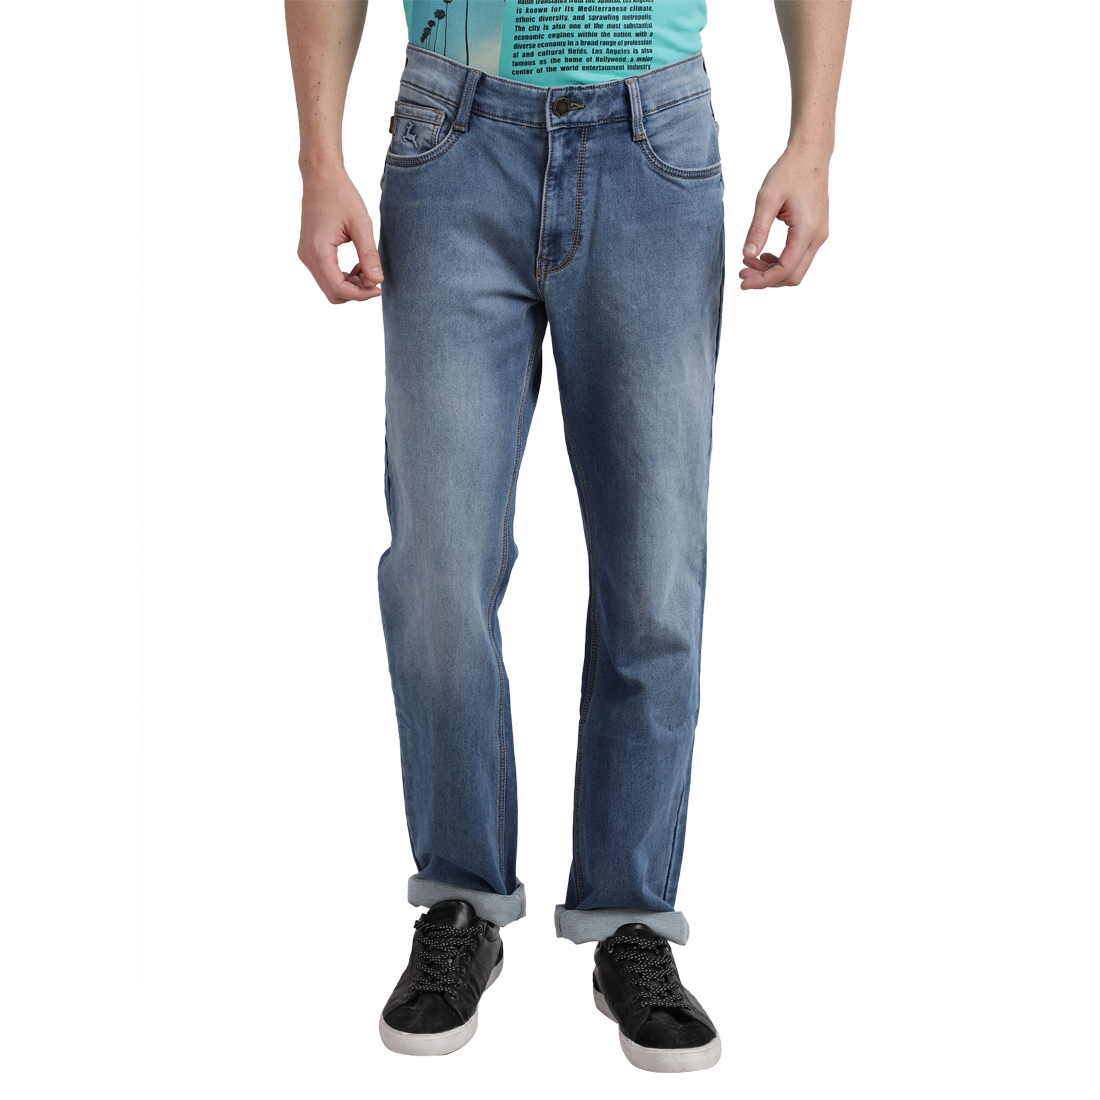 PARX | PARX Medium Blue Jeans